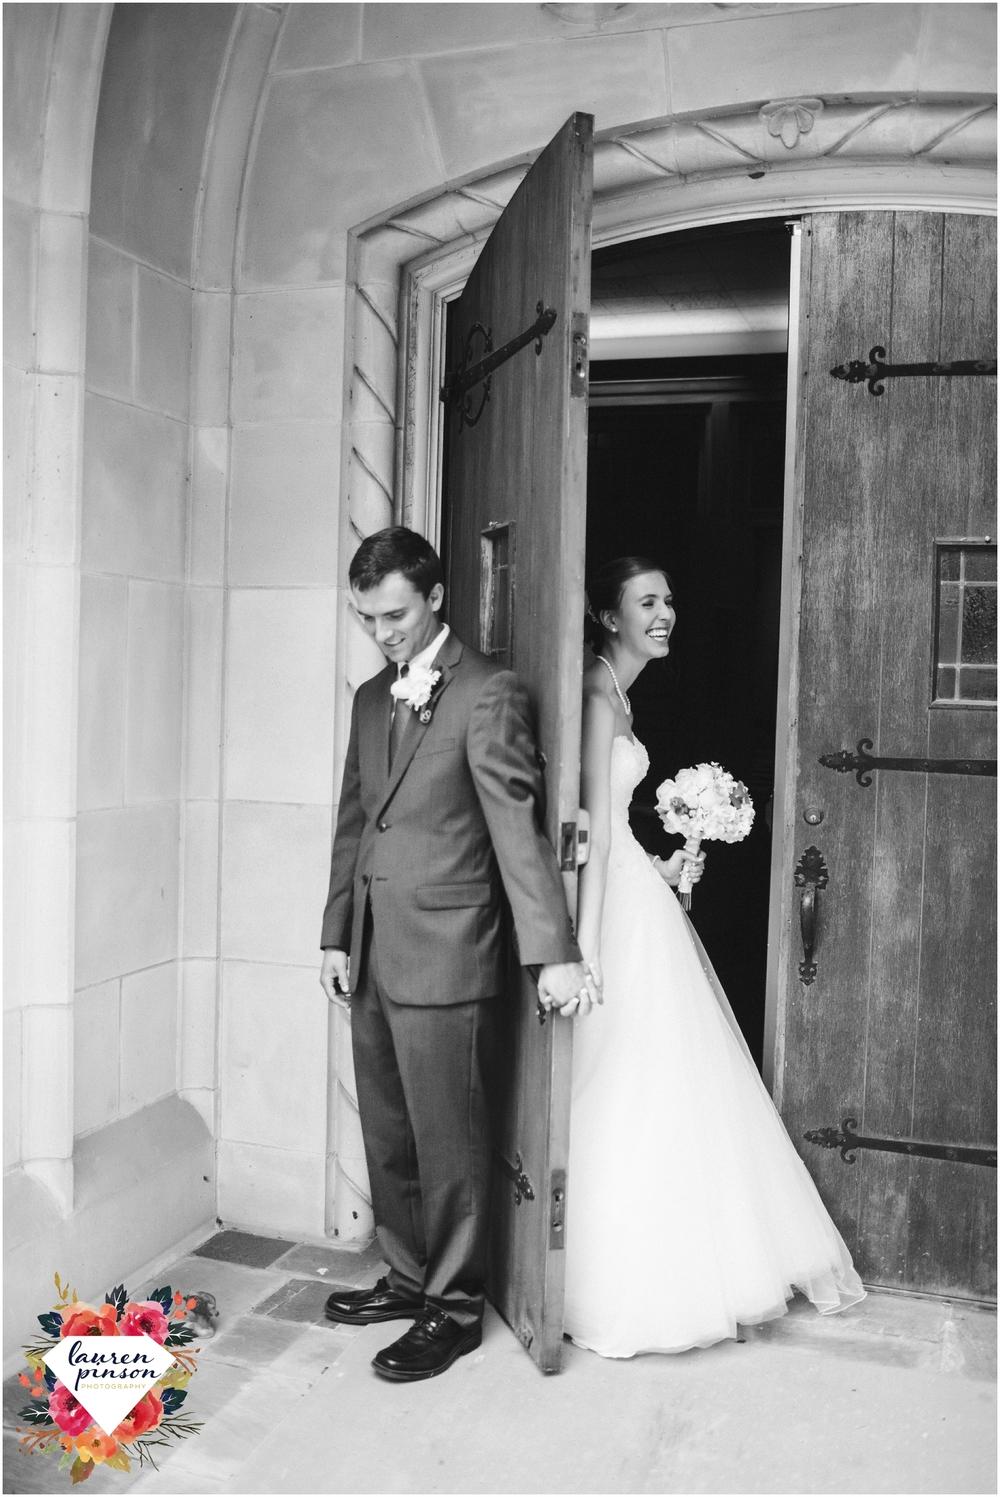 wichita-falls-wedding-photography-at-fain-presbyterian-church-and-the-wellington-timeless-classic-modern-photographer_1128.jpg